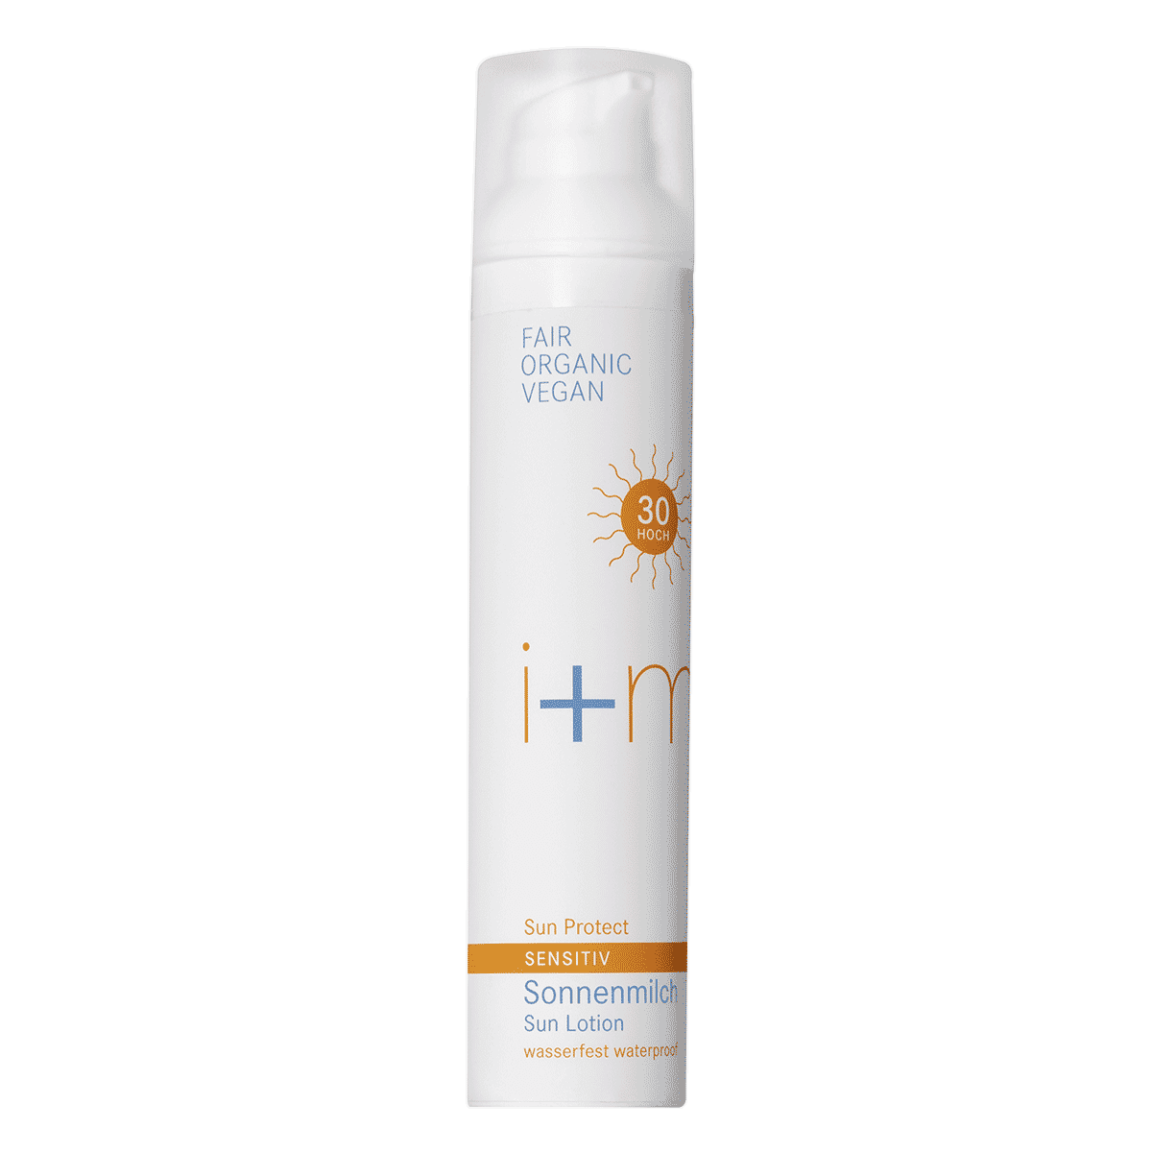 Sun Protect Sonnenmilch 30 sensitiv